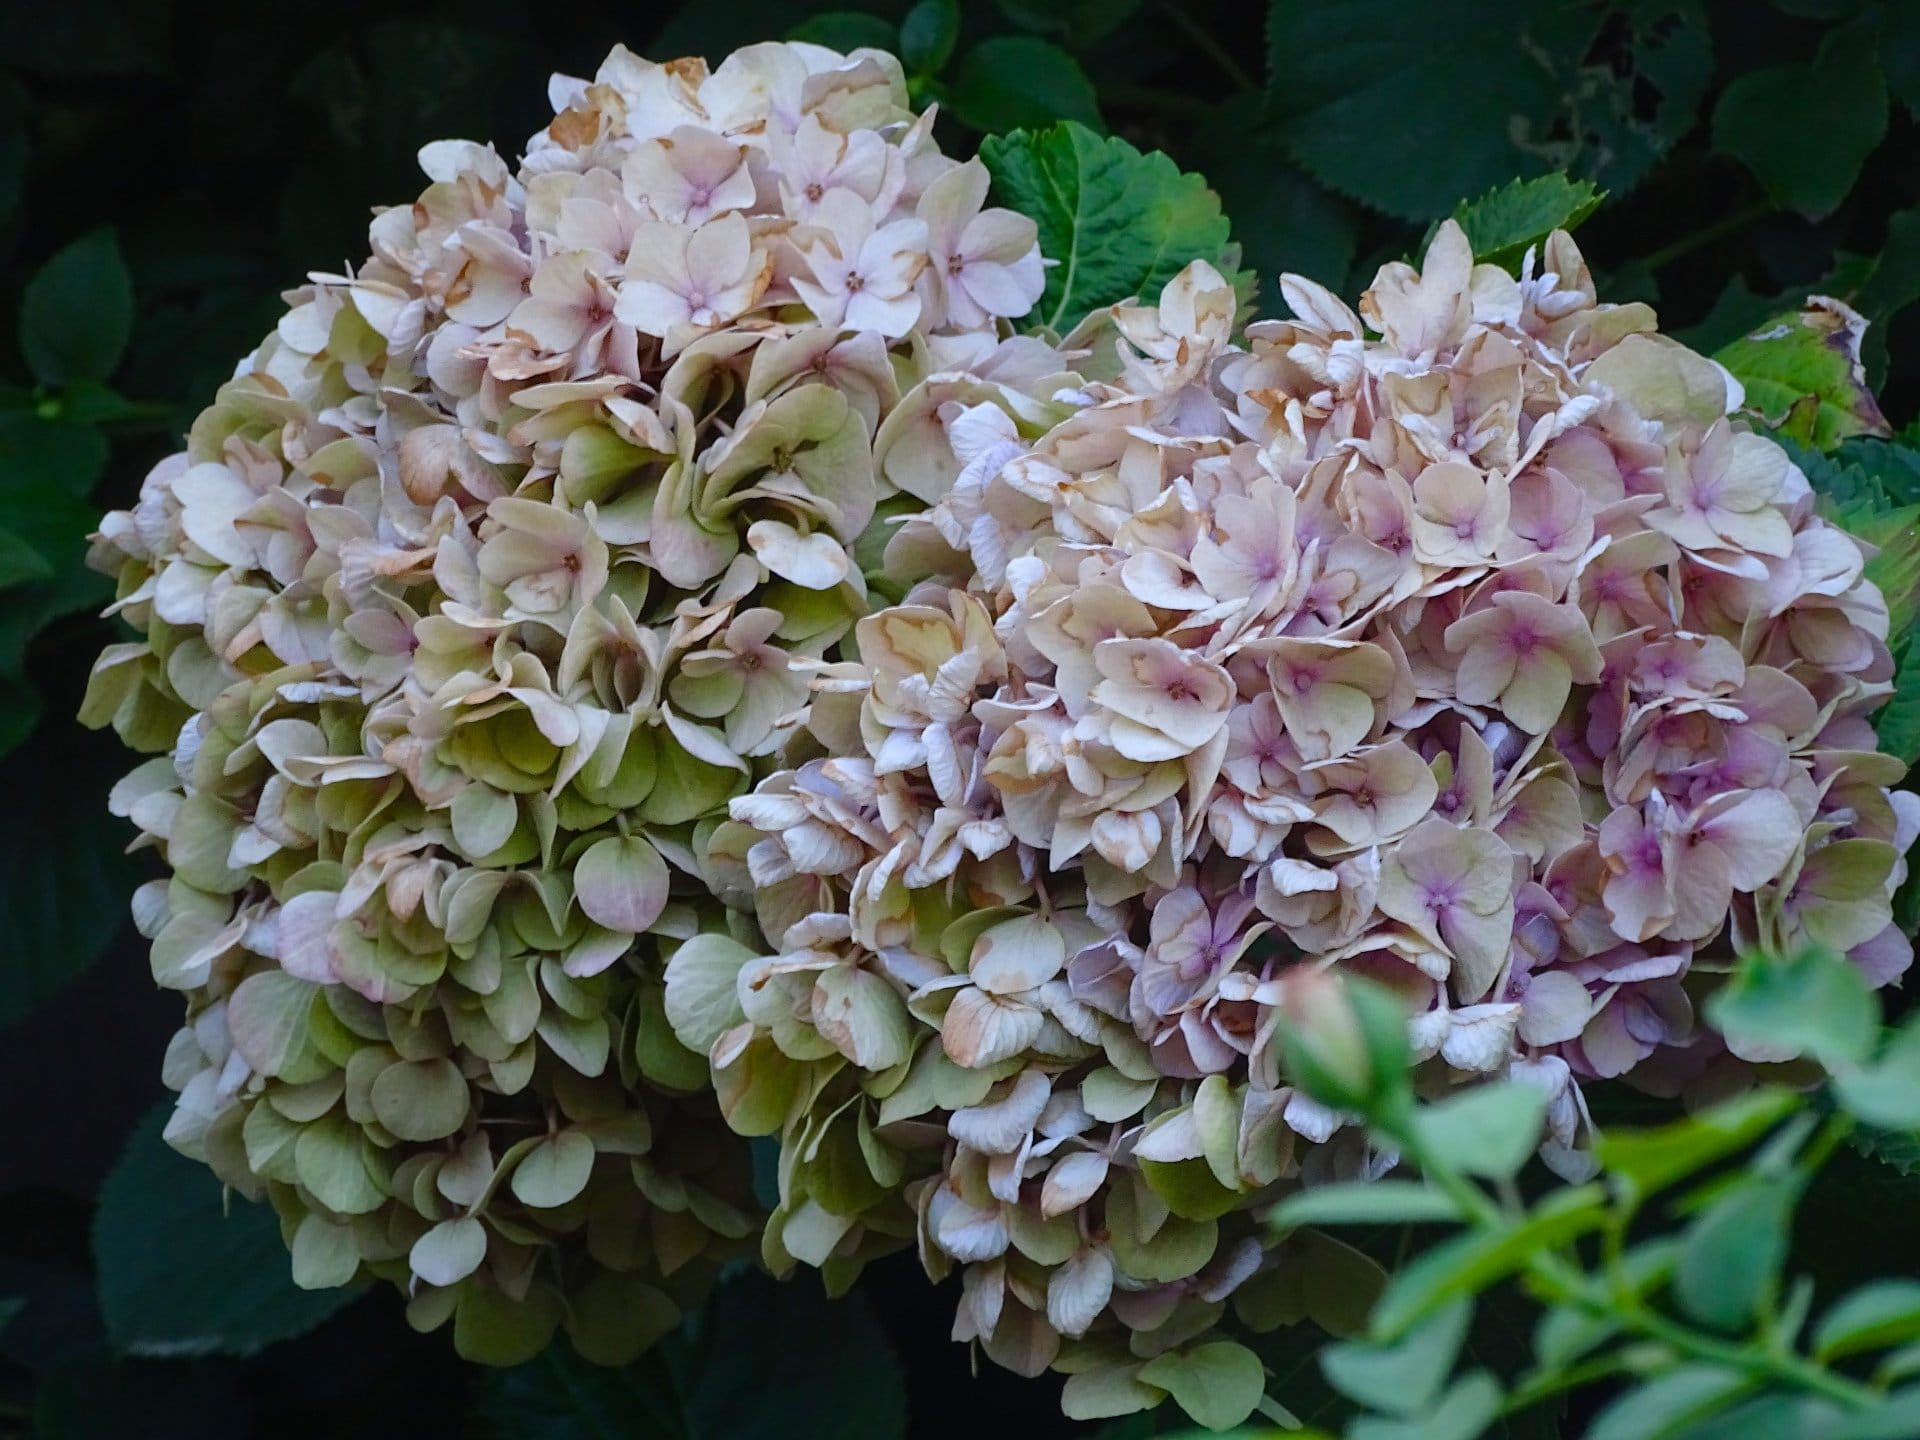 2015 07 23 fadingflowers 2